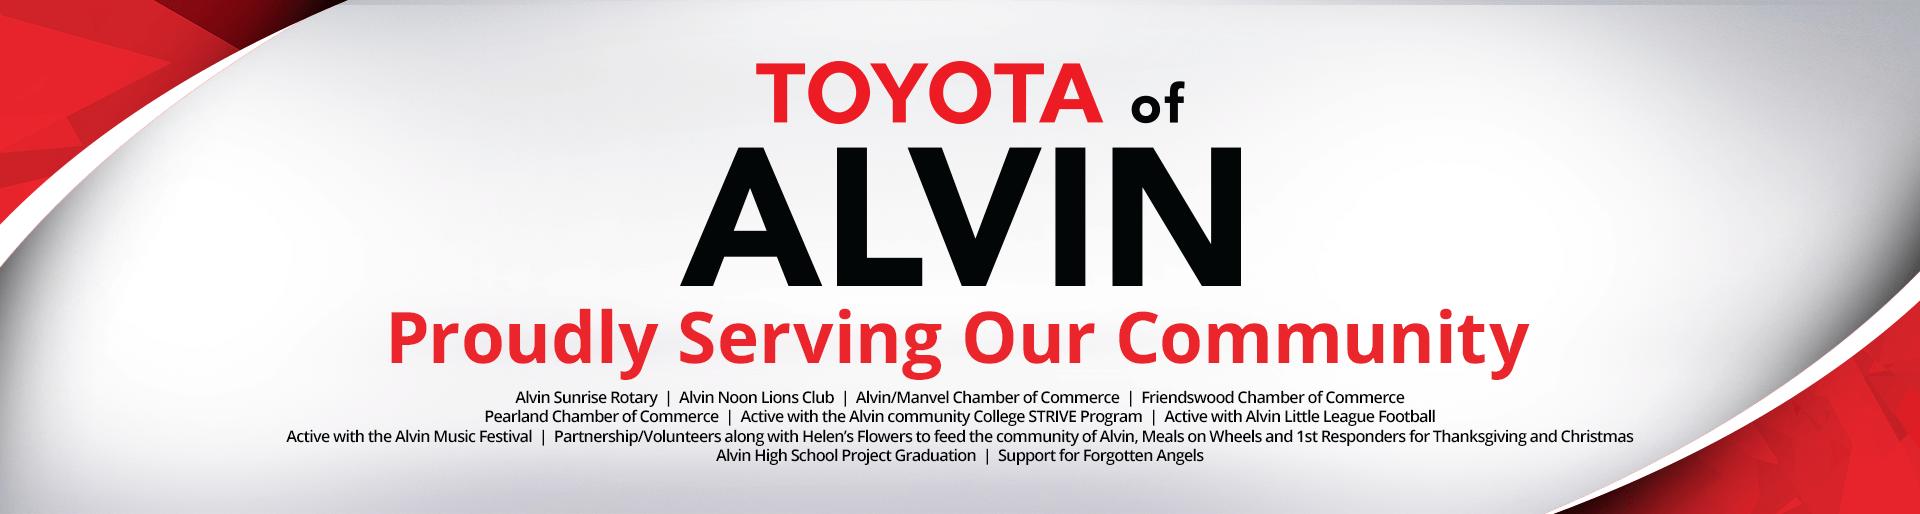 Alvin TX Community